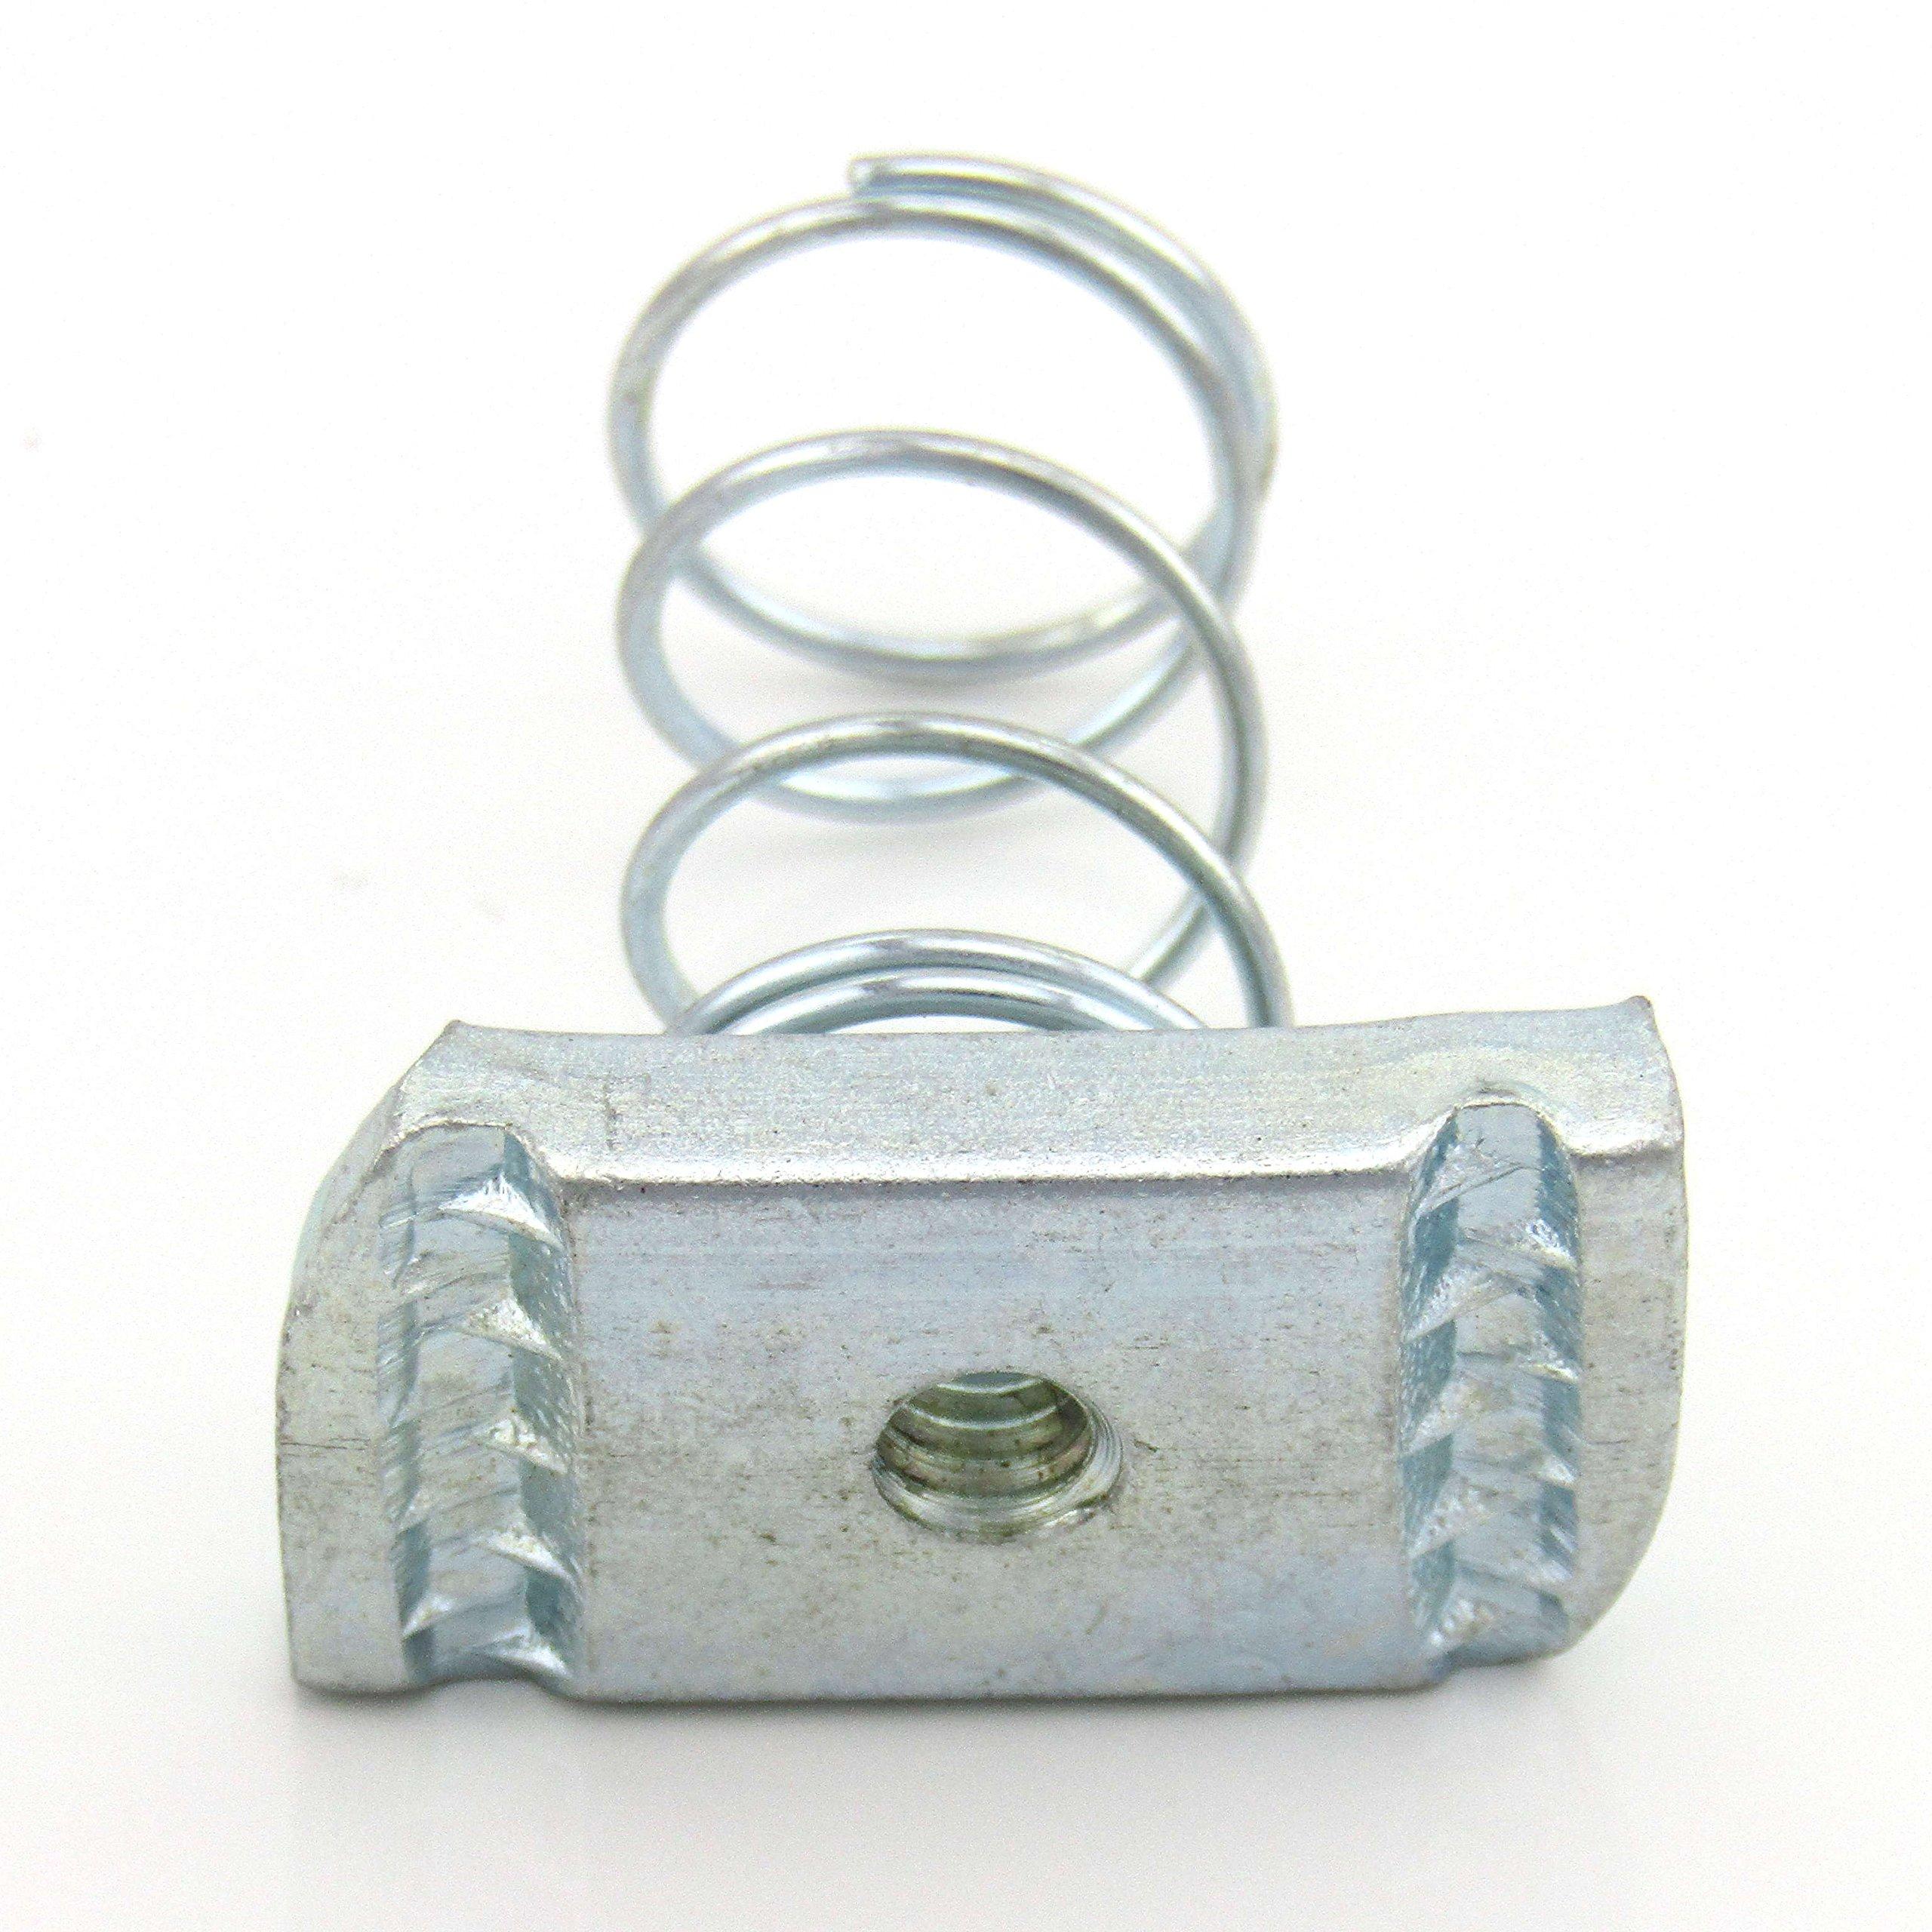 1/4-20X1/4 Thick, Regular Spring Nut (100 per Box) by ARWS